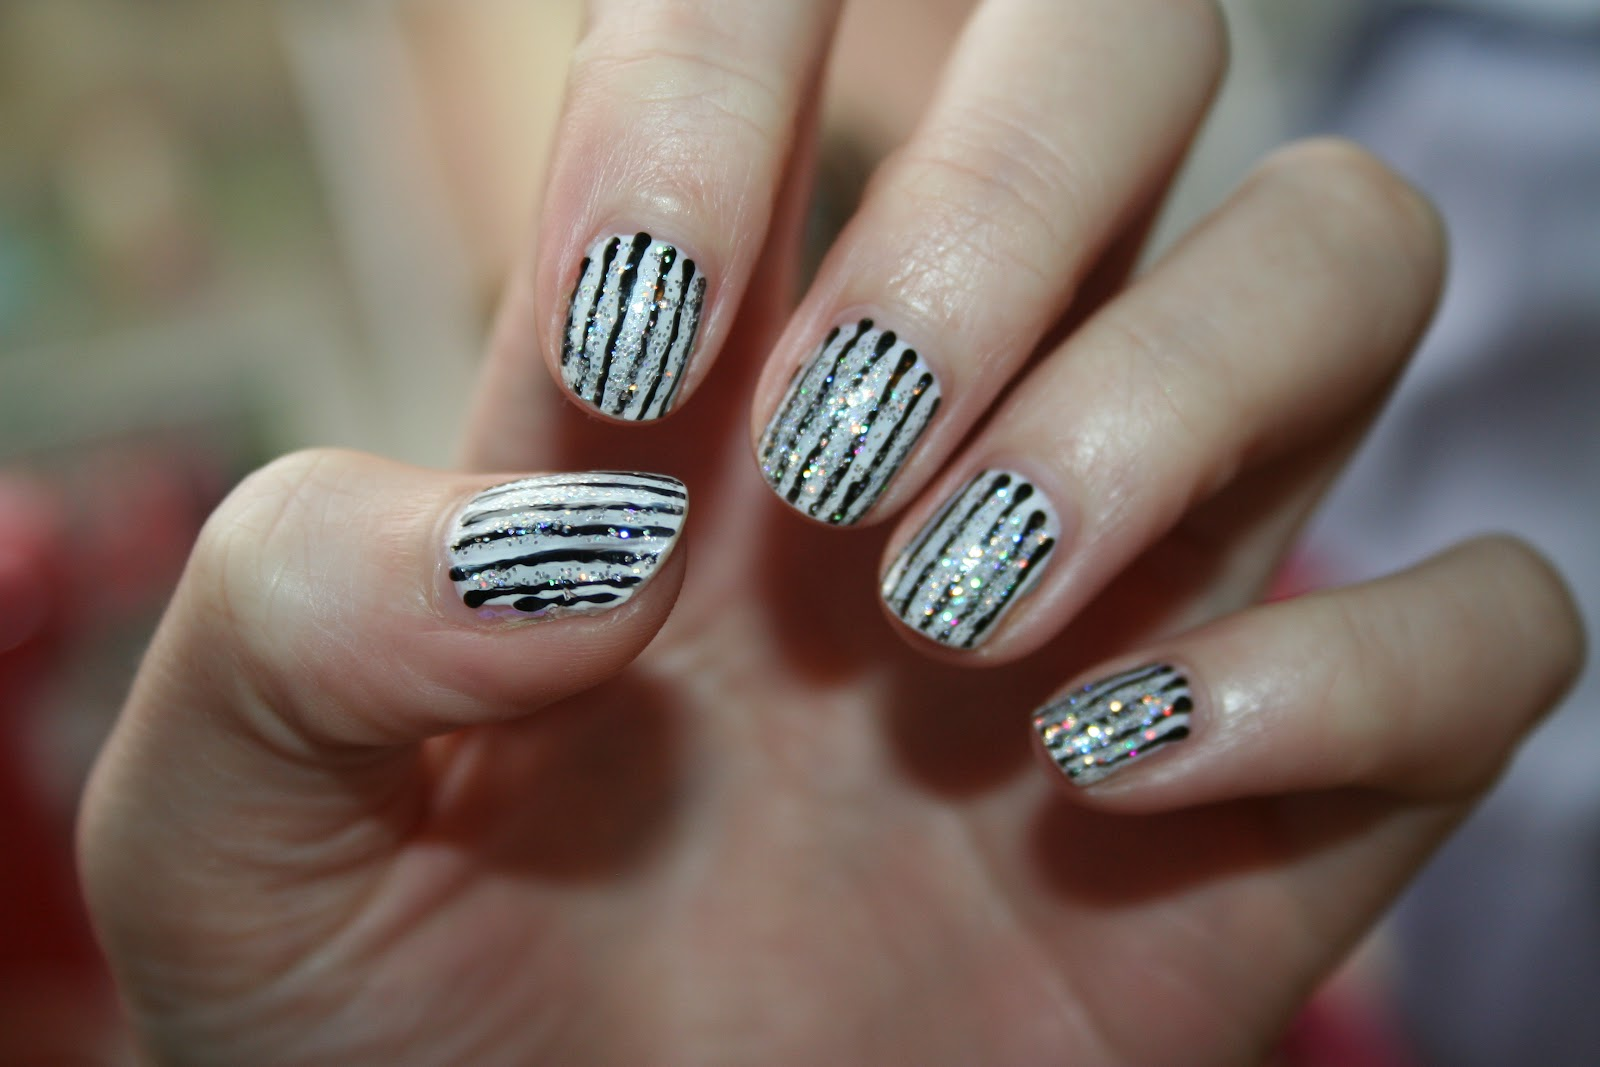 75 most stylish nail art pattern design ideas black and white glitter stripes pattern nail art prinsesfo Choice Image